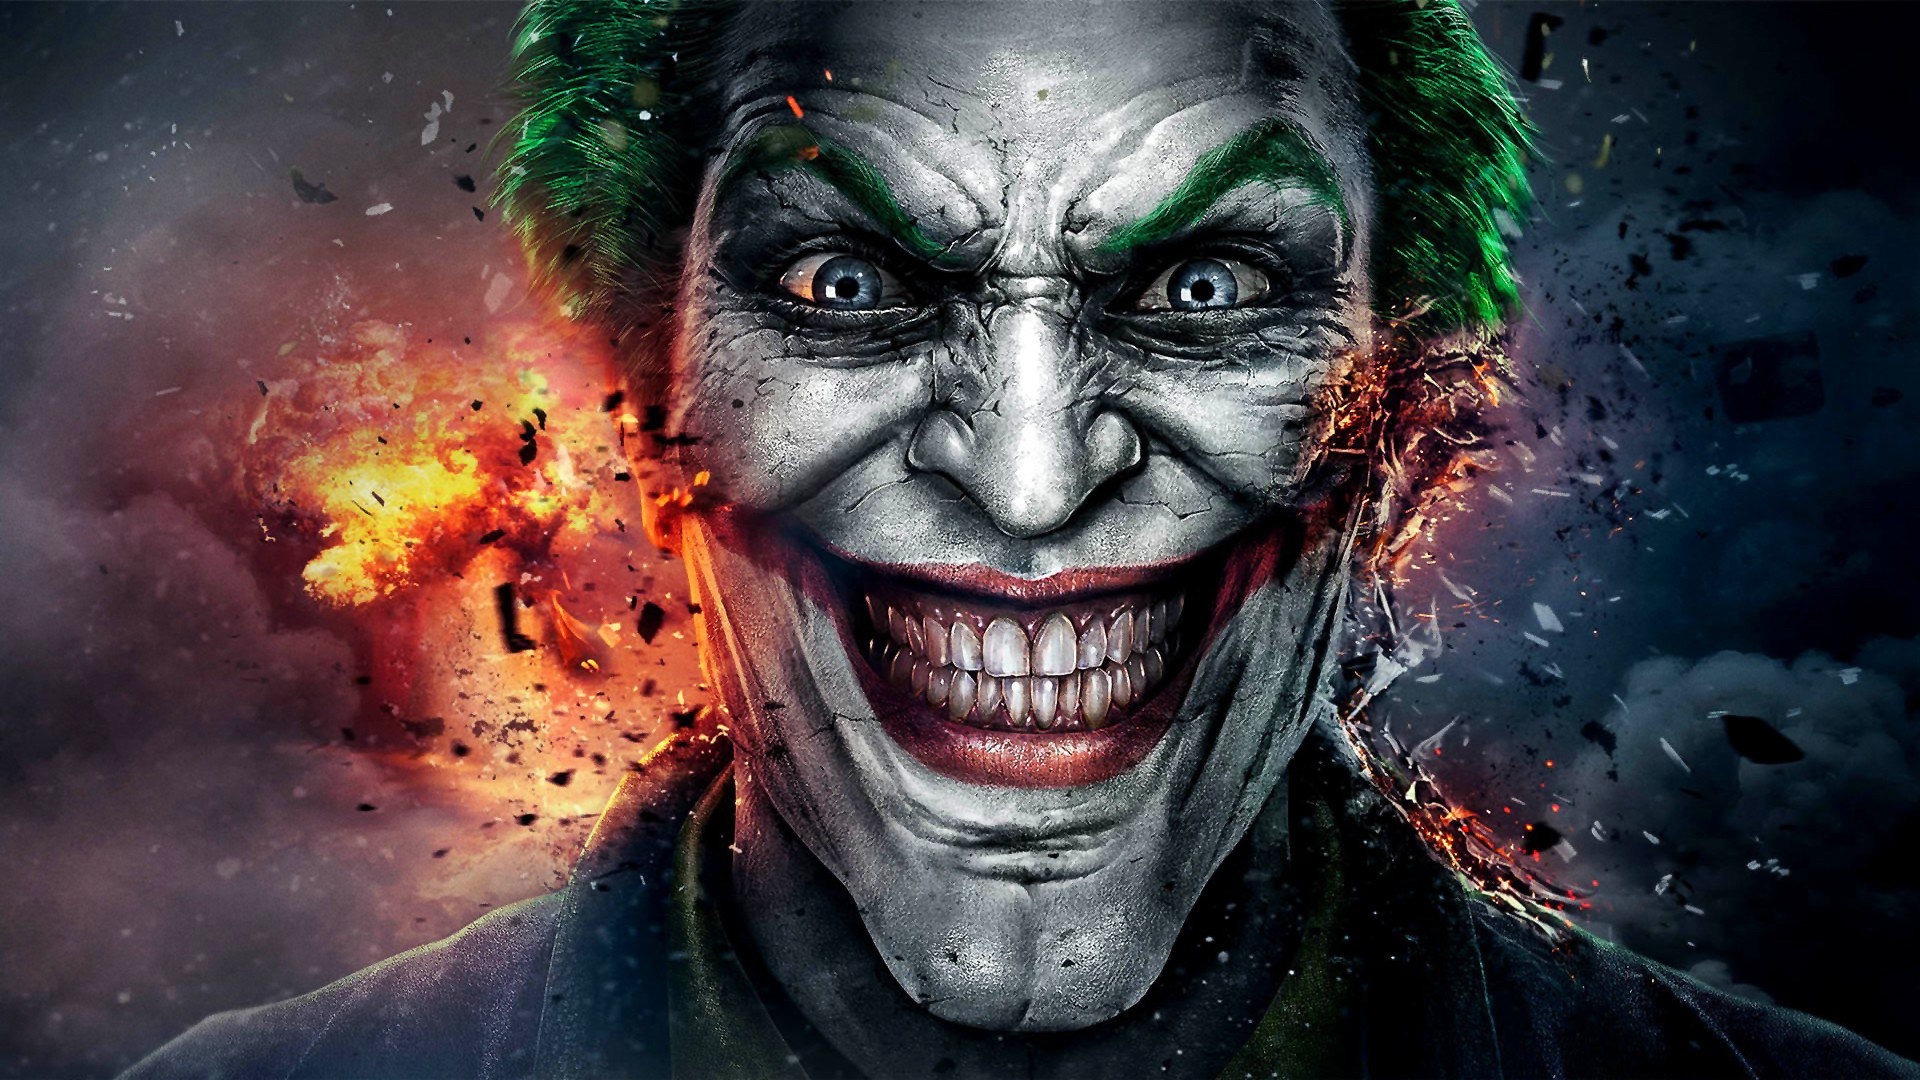 Suicide Squad Joker Wallpaper Mobile